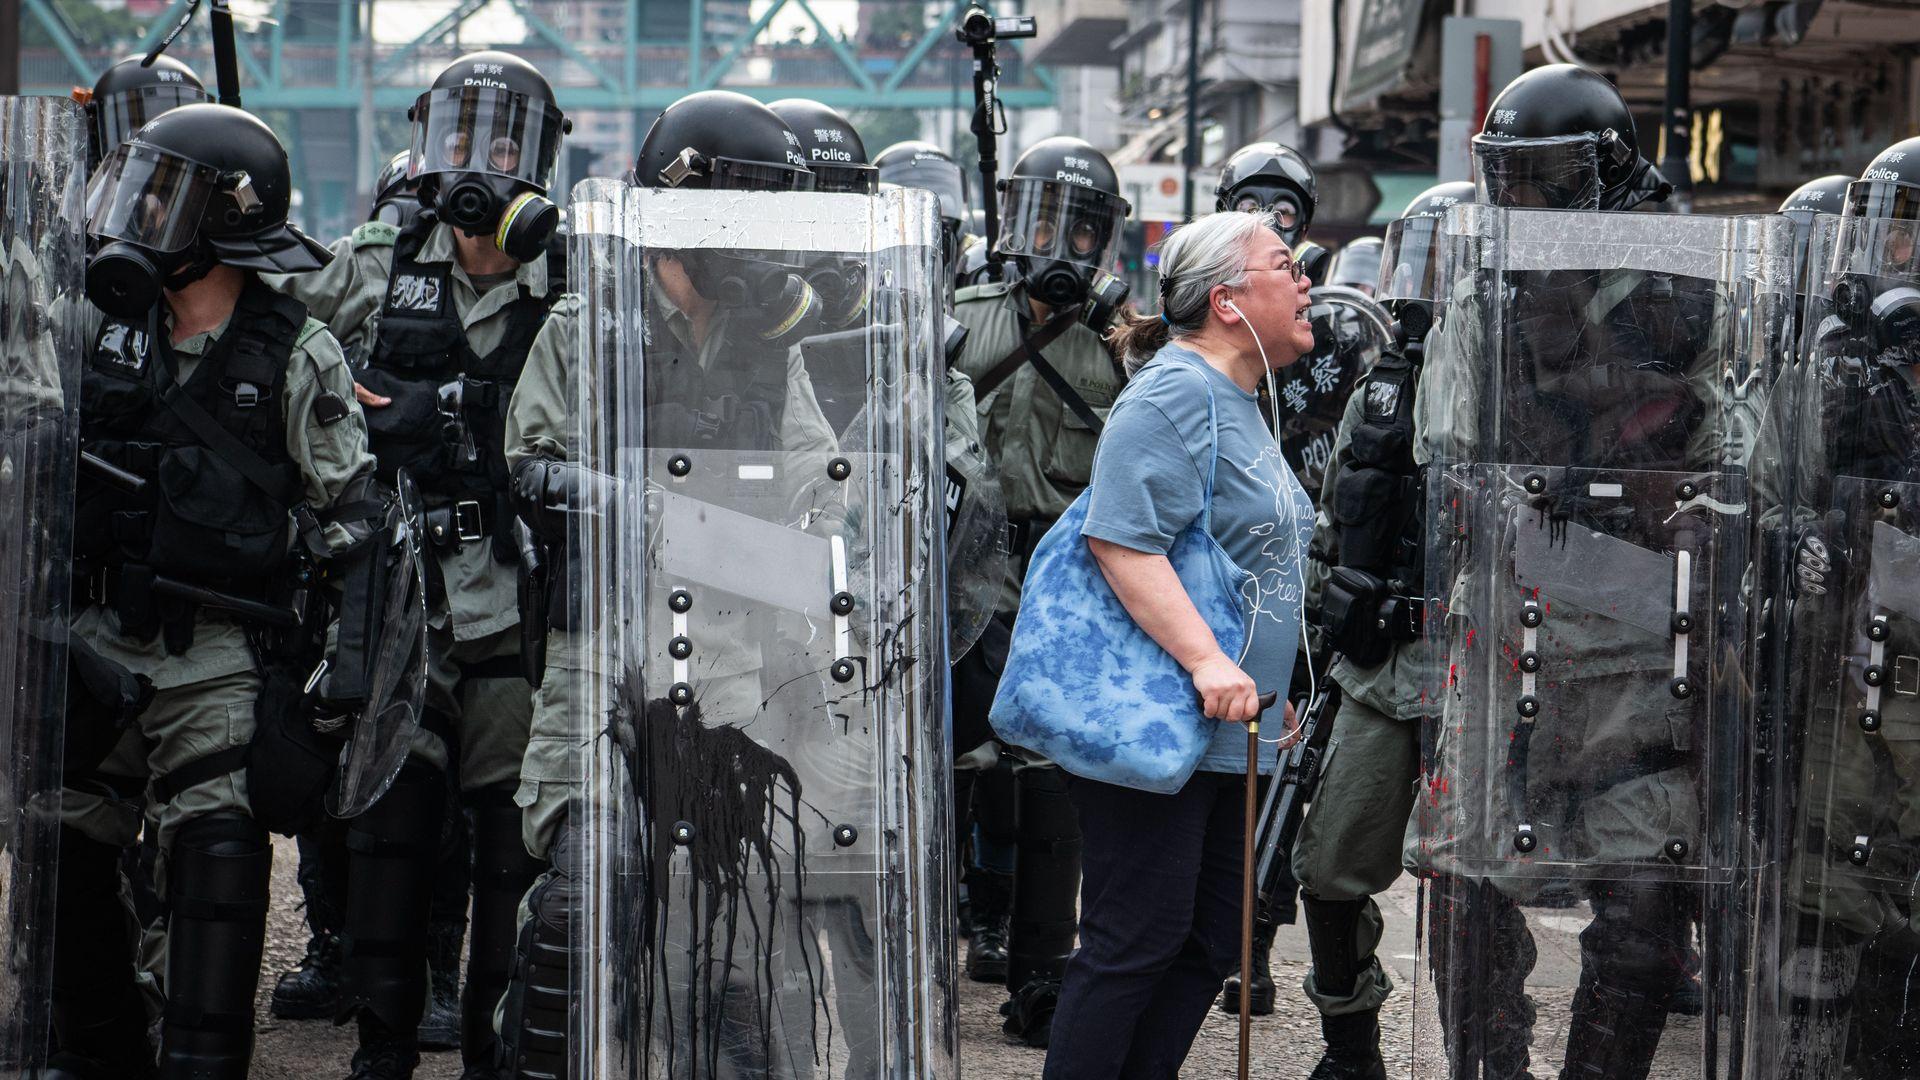 A woman screams at riot police